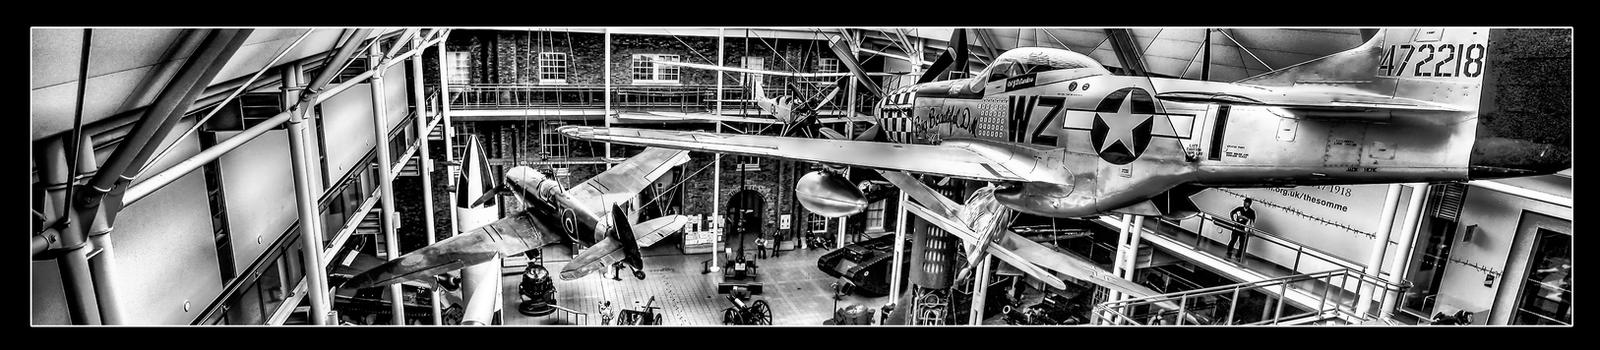 Imperial War Museum - London by rickuk73